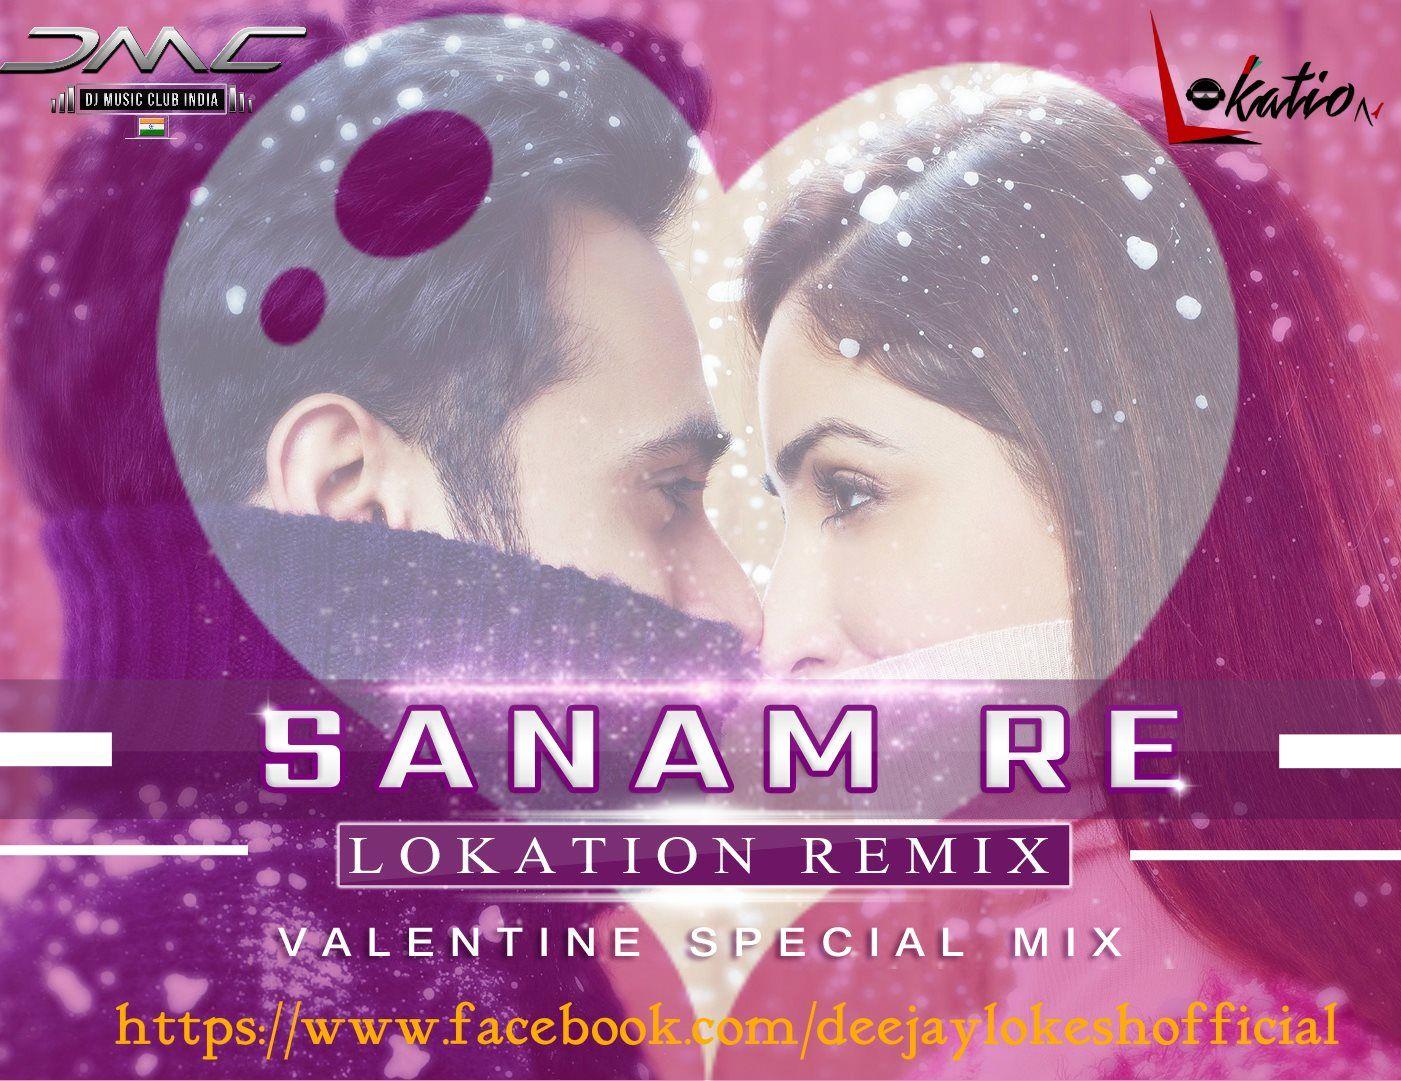 Lokation music sanam re lokation remix download audiomack